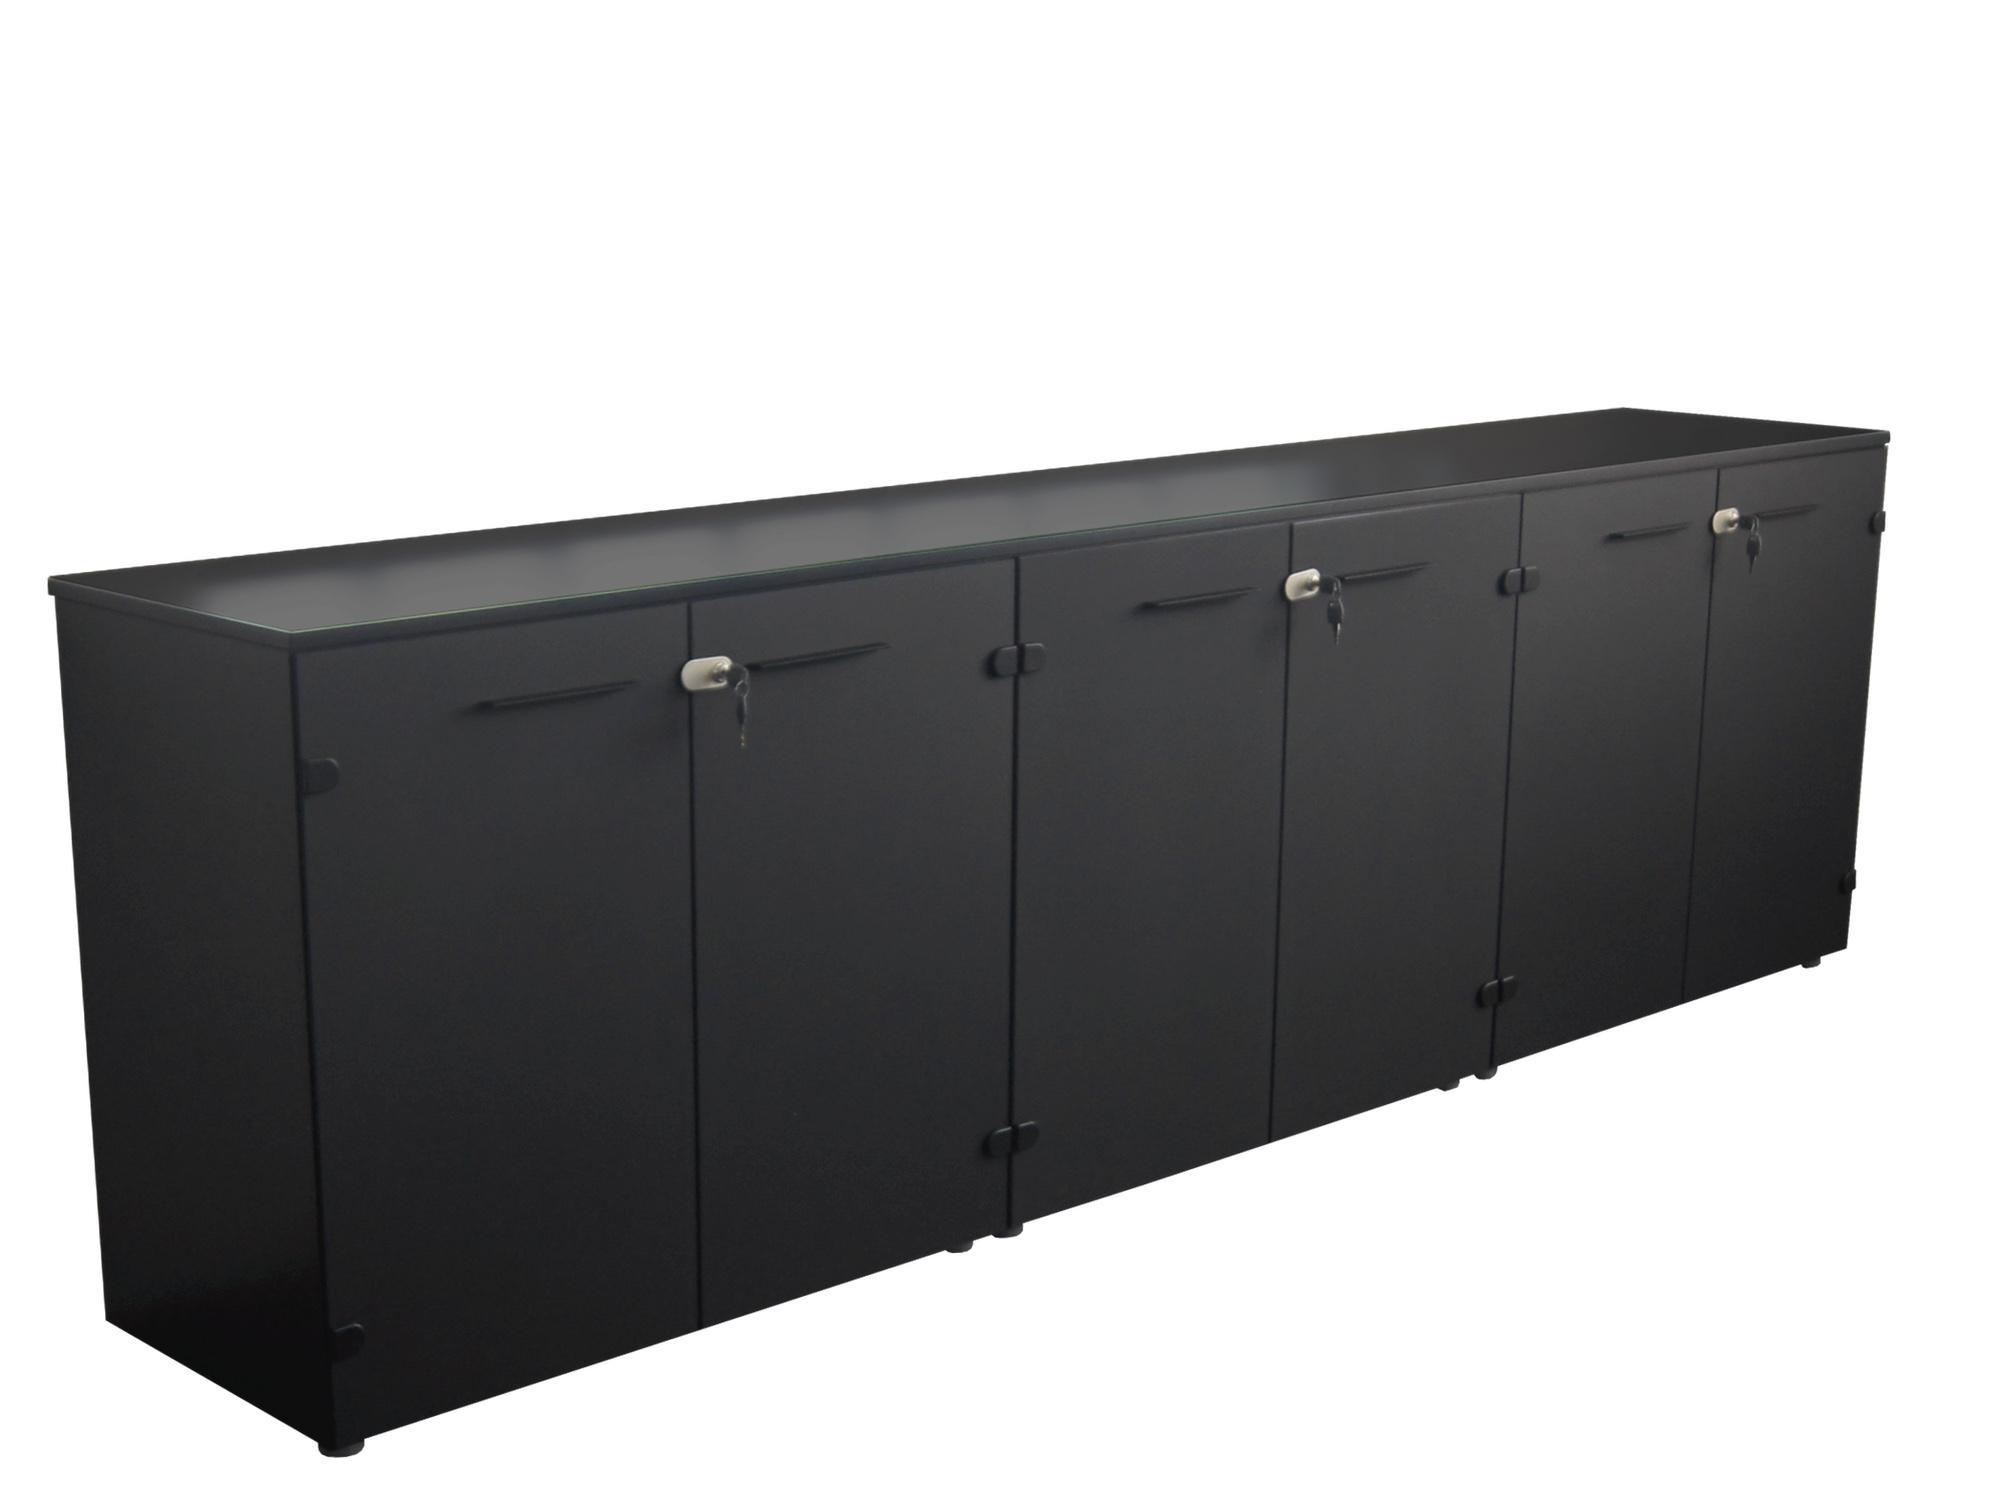 frezza passepartout sideboard 270x45x74 5 cm mit glast ren sideboards b roschr nke alle. Black Bedroom Furniture Sets. Home Design Ideas